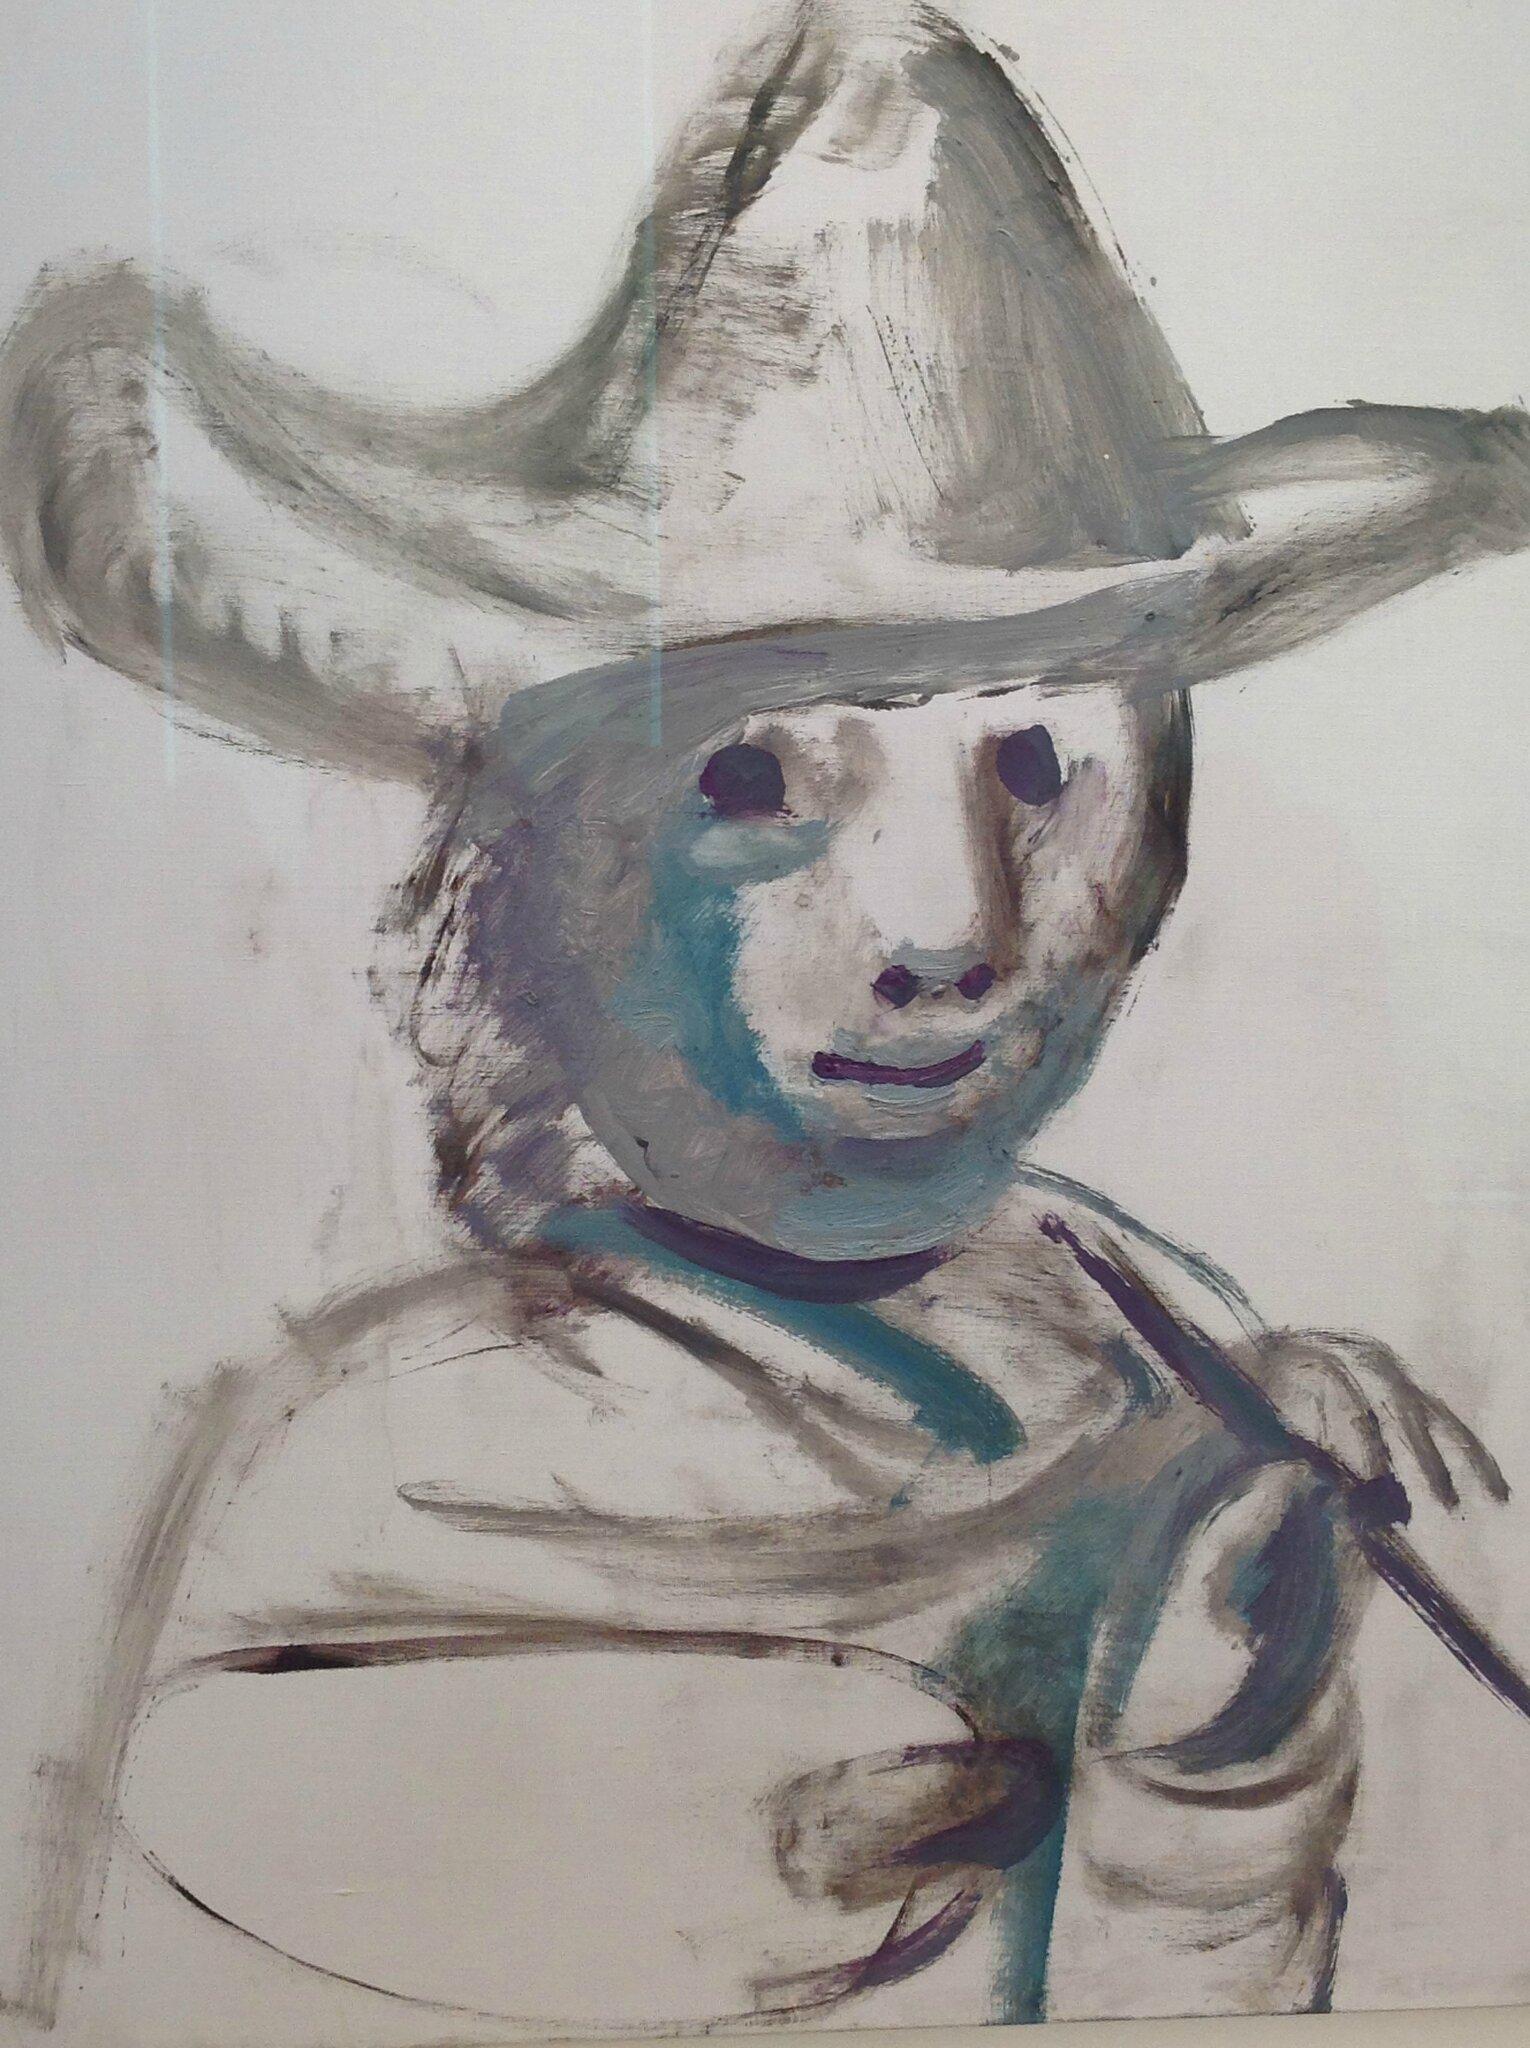 Picasso jeune peintre